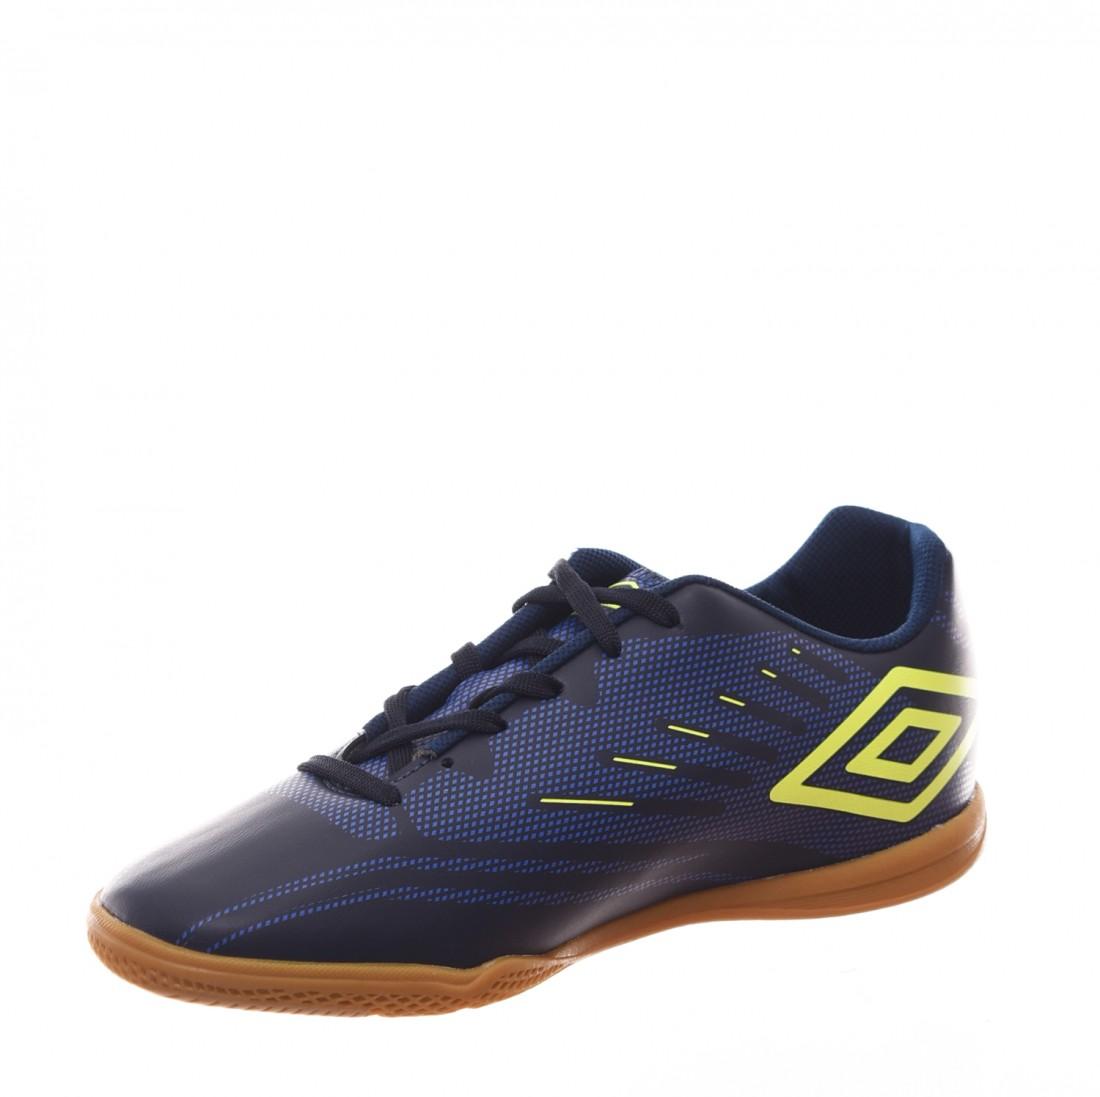 Chuteira Futsal Umbro Speed IV Azul Marinho - LM Martins - Veste ... 5422bfc876f44